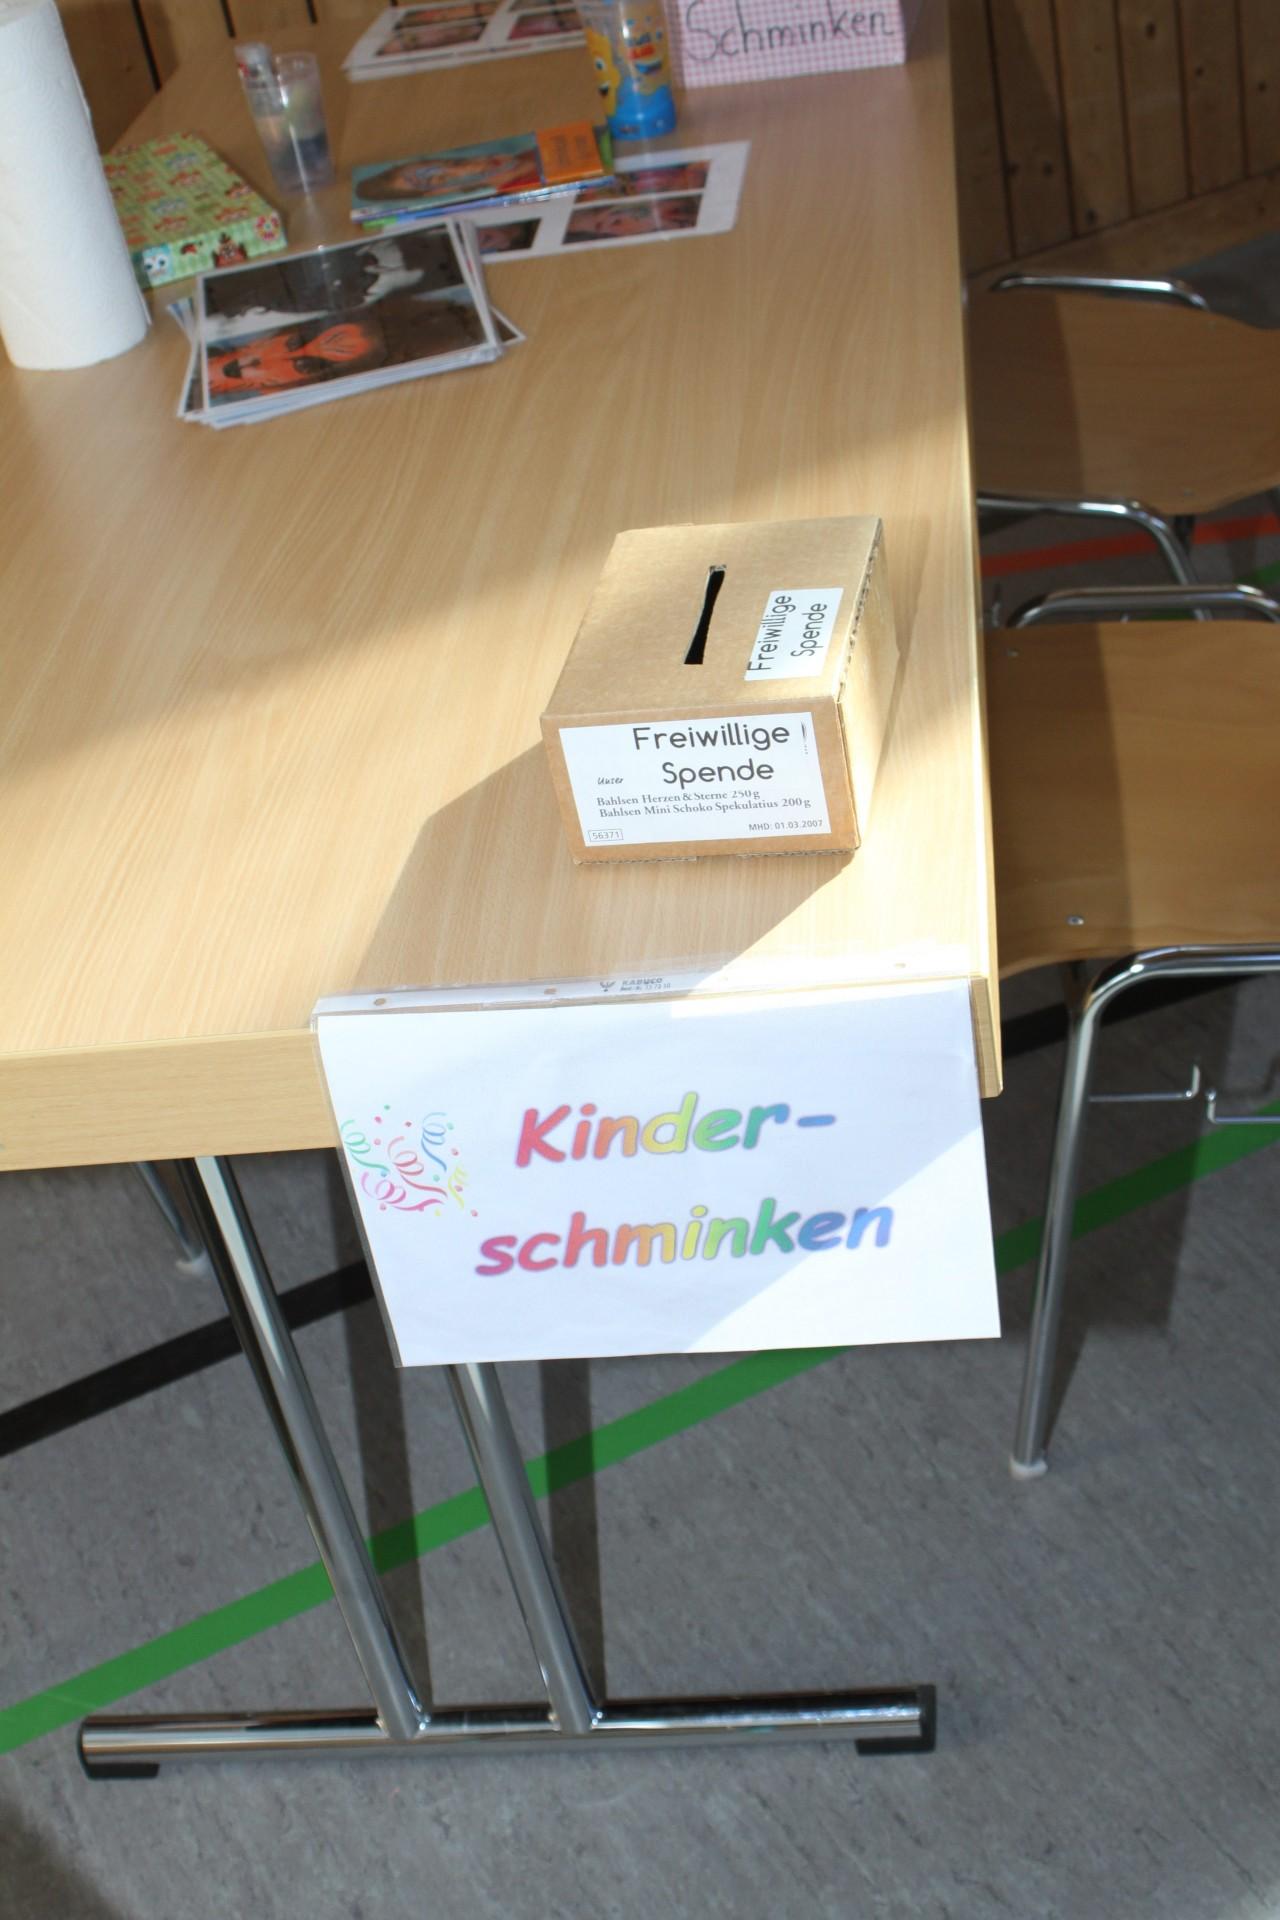 TSV Kinderfasching 2020 (12)